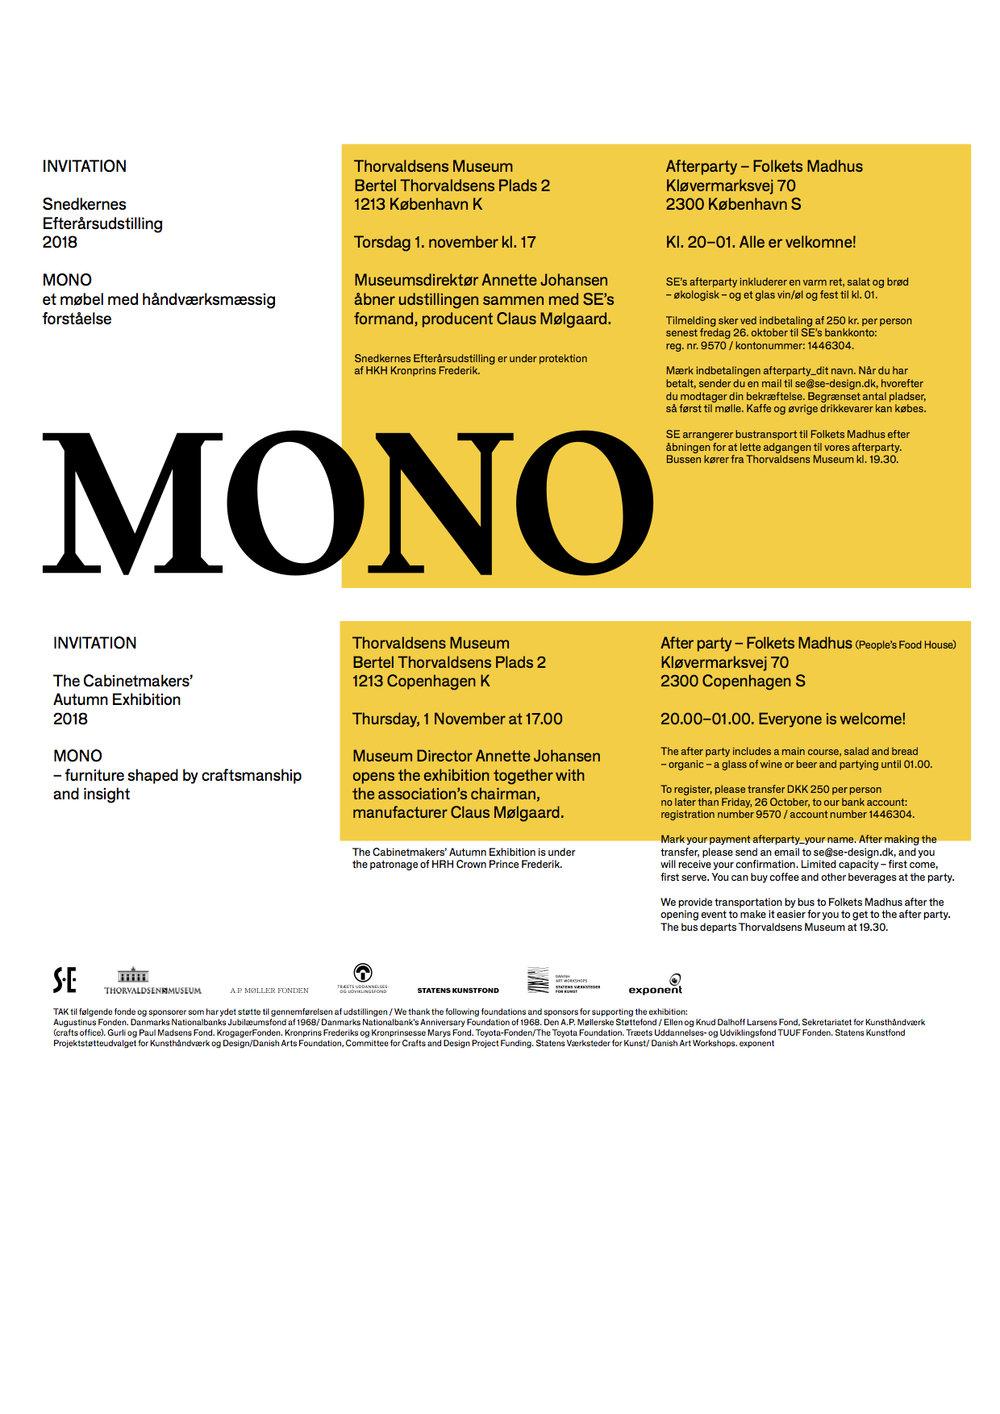 Mono invitation.jpg